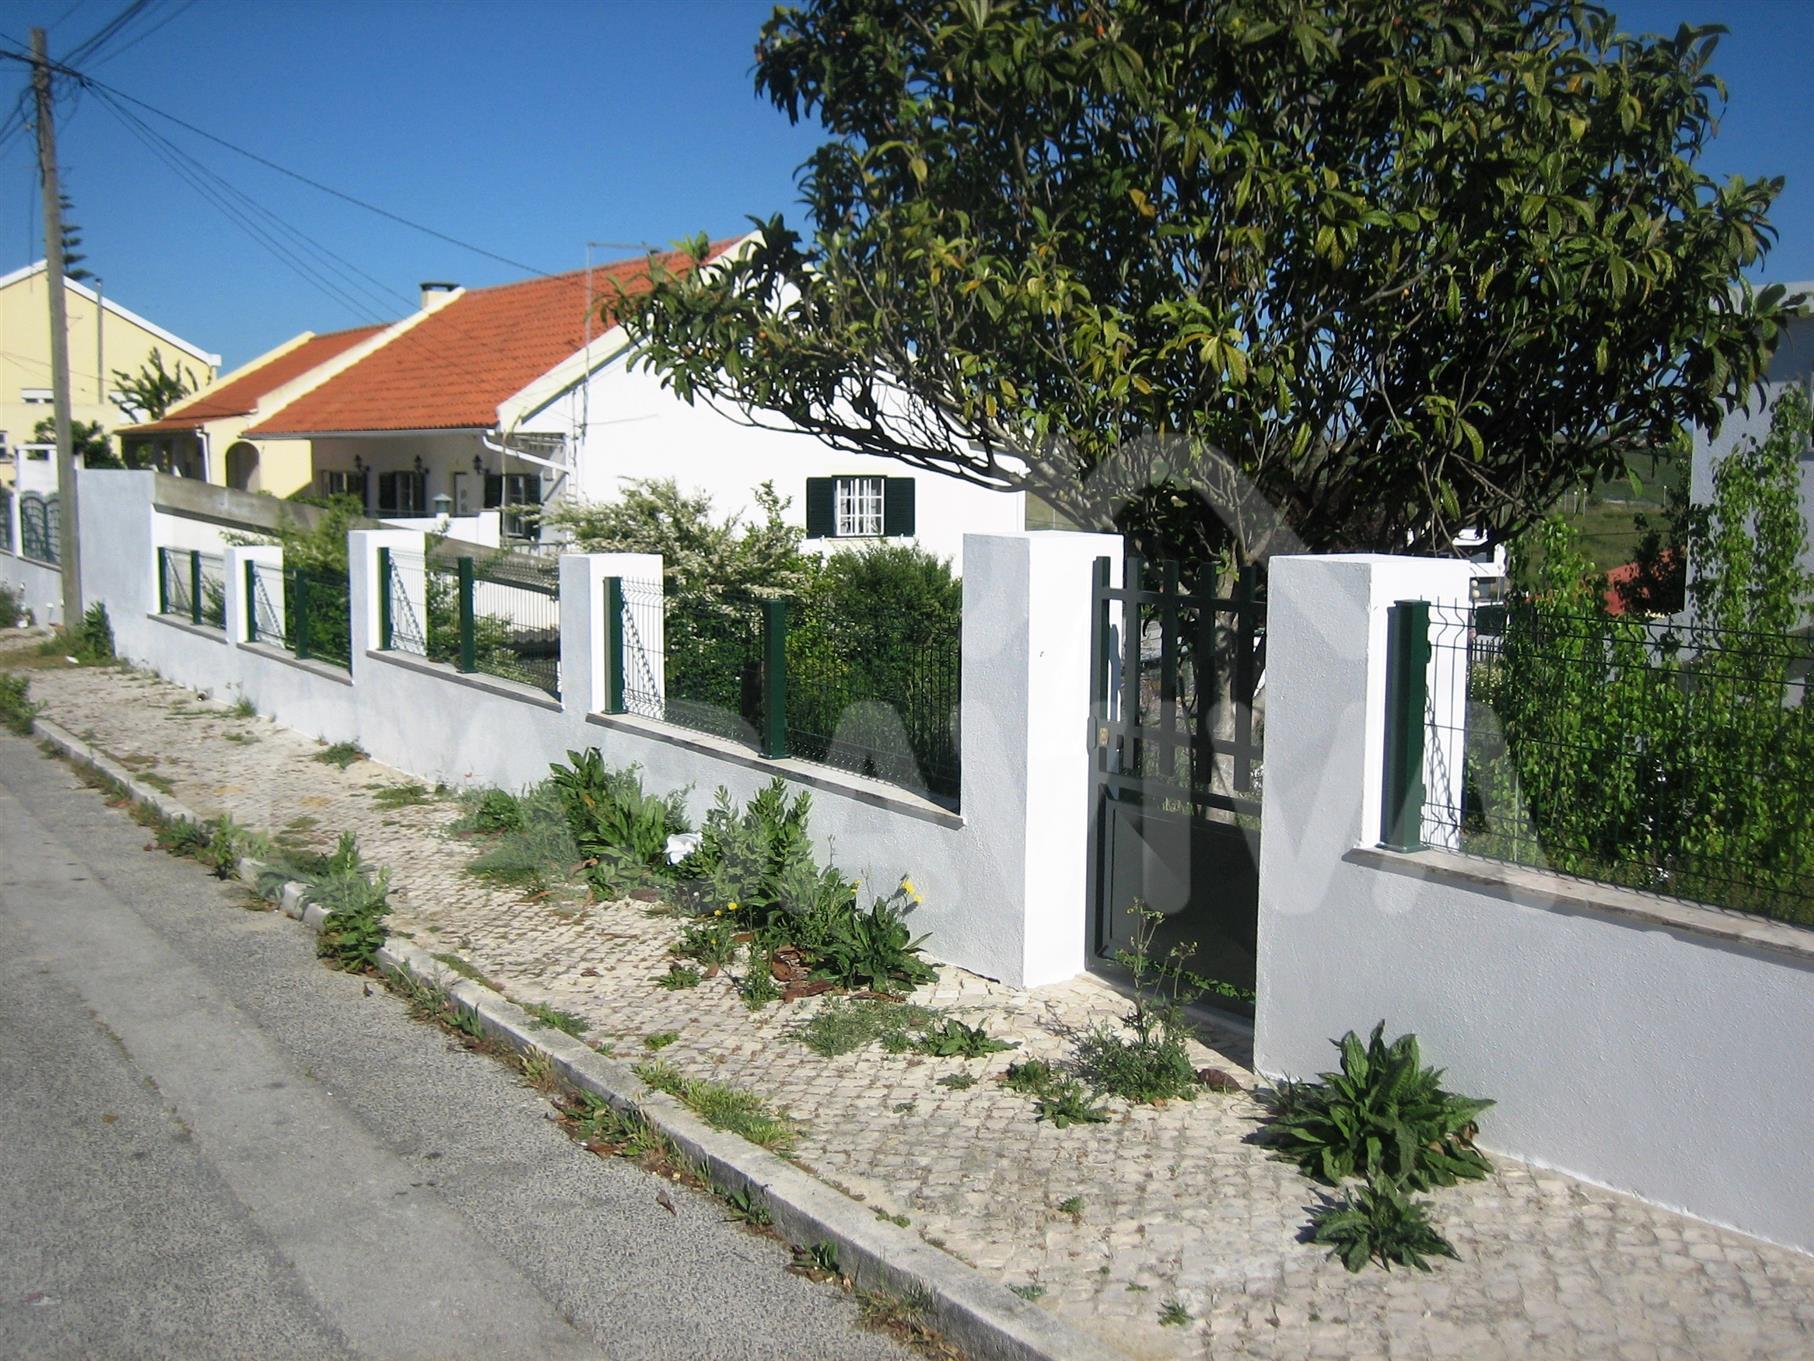 Foi reabilitado todo o muro envolvente da propriedade.